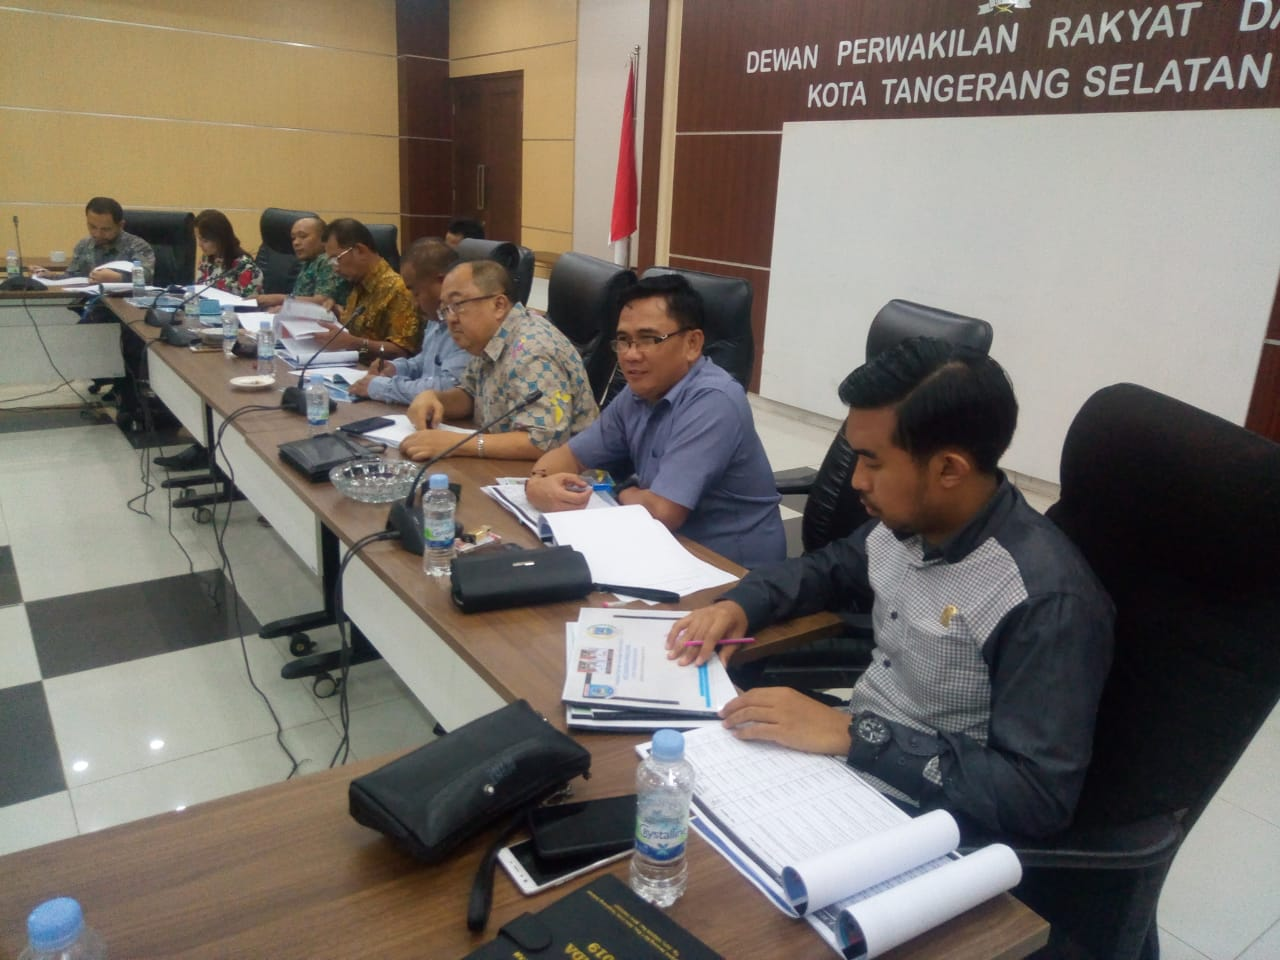 Dana Bantuan Kelurahan  di Tangsel Terserap 80%, Mayoritas Untuk Pemberdayaan Masyarakat